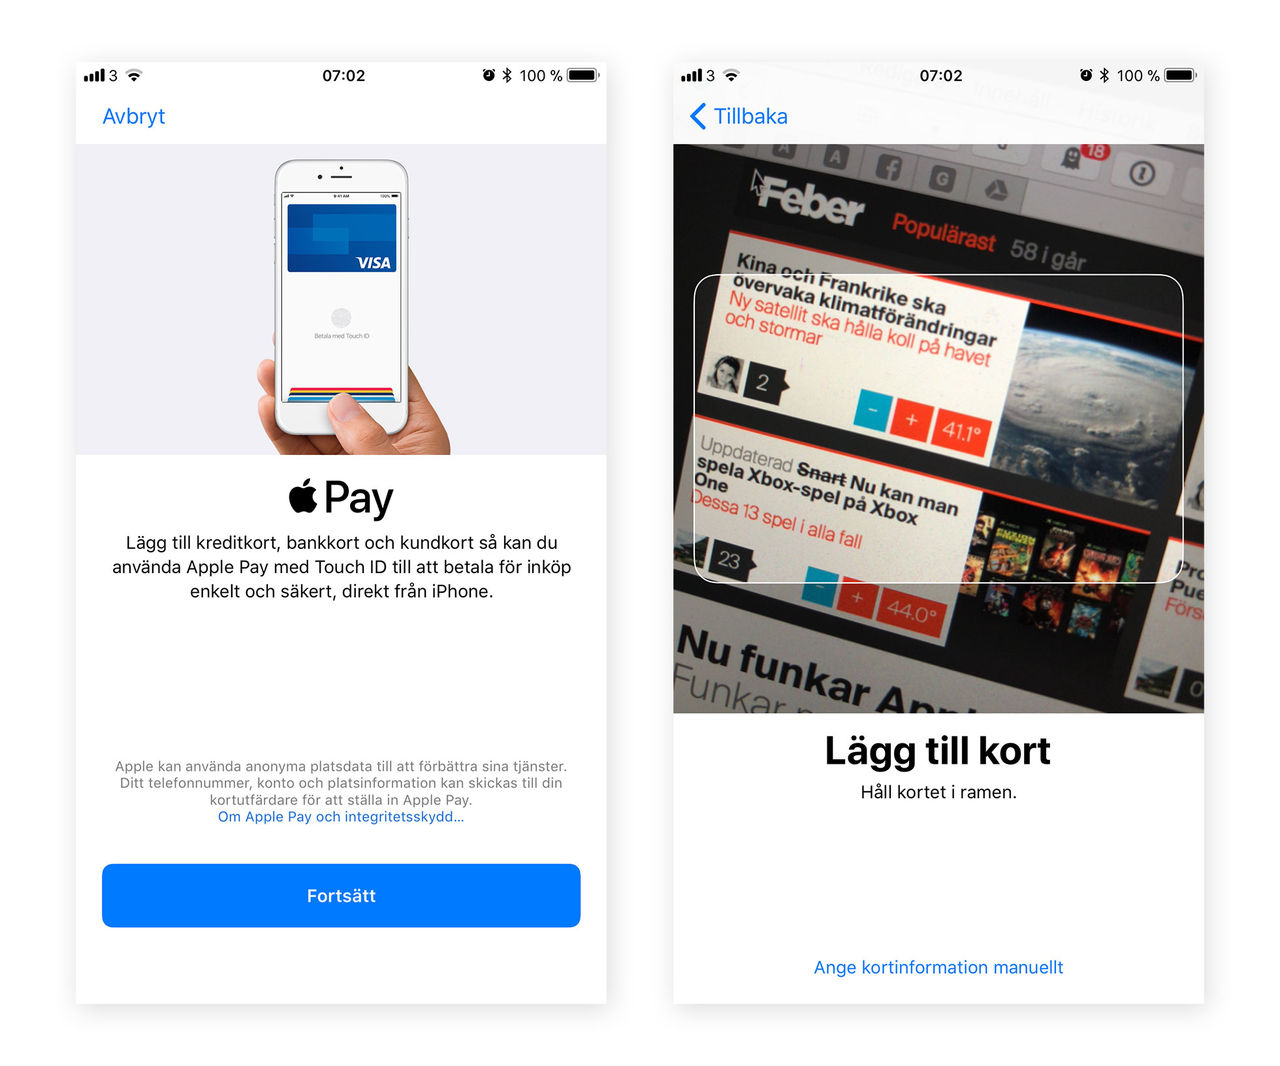 Nu funkar Apple Pay i Sverige!